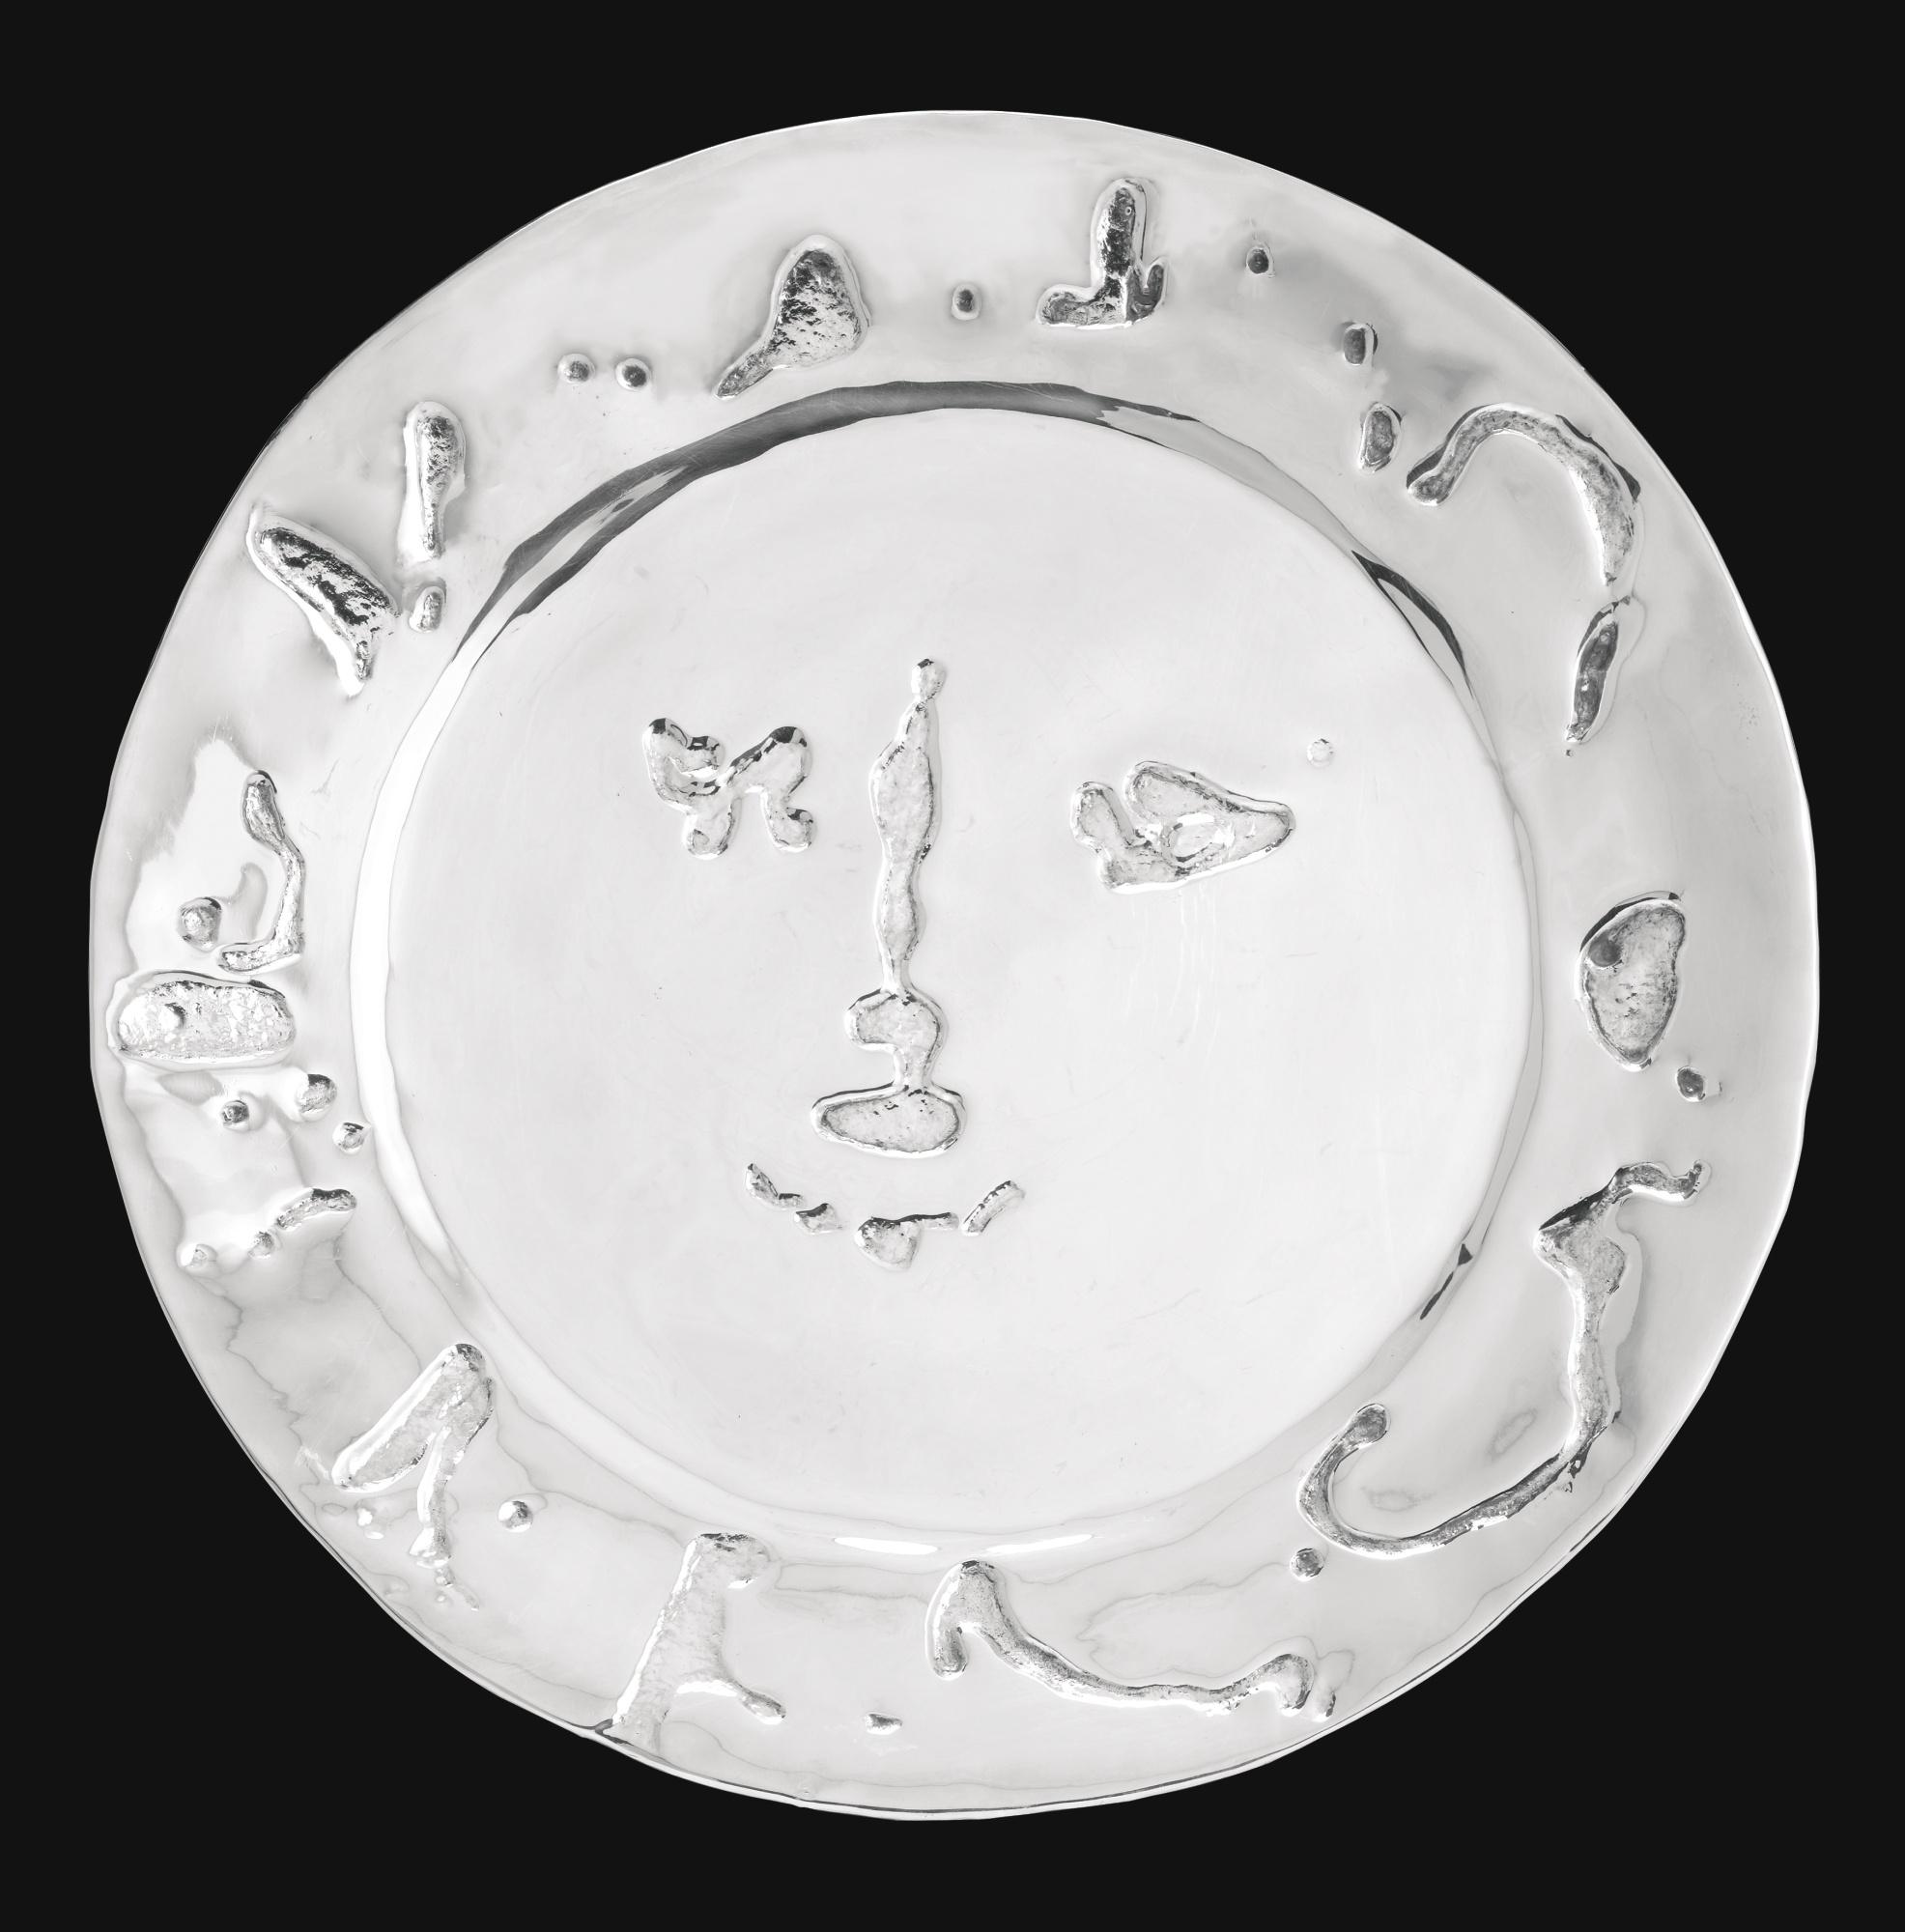 Pablo Picasso-Visage Larve-1967